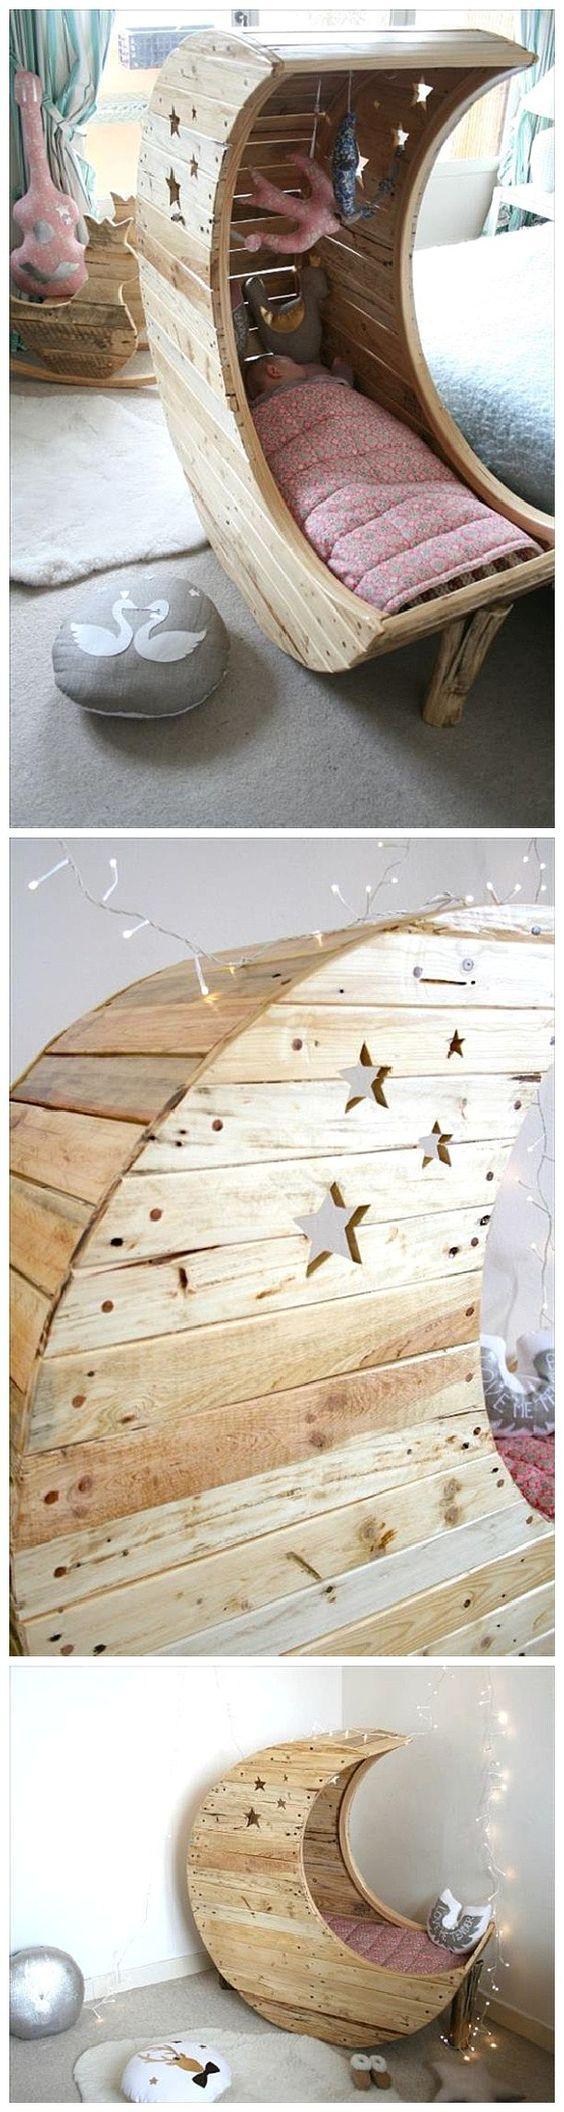 diy mobiliario paletes 4